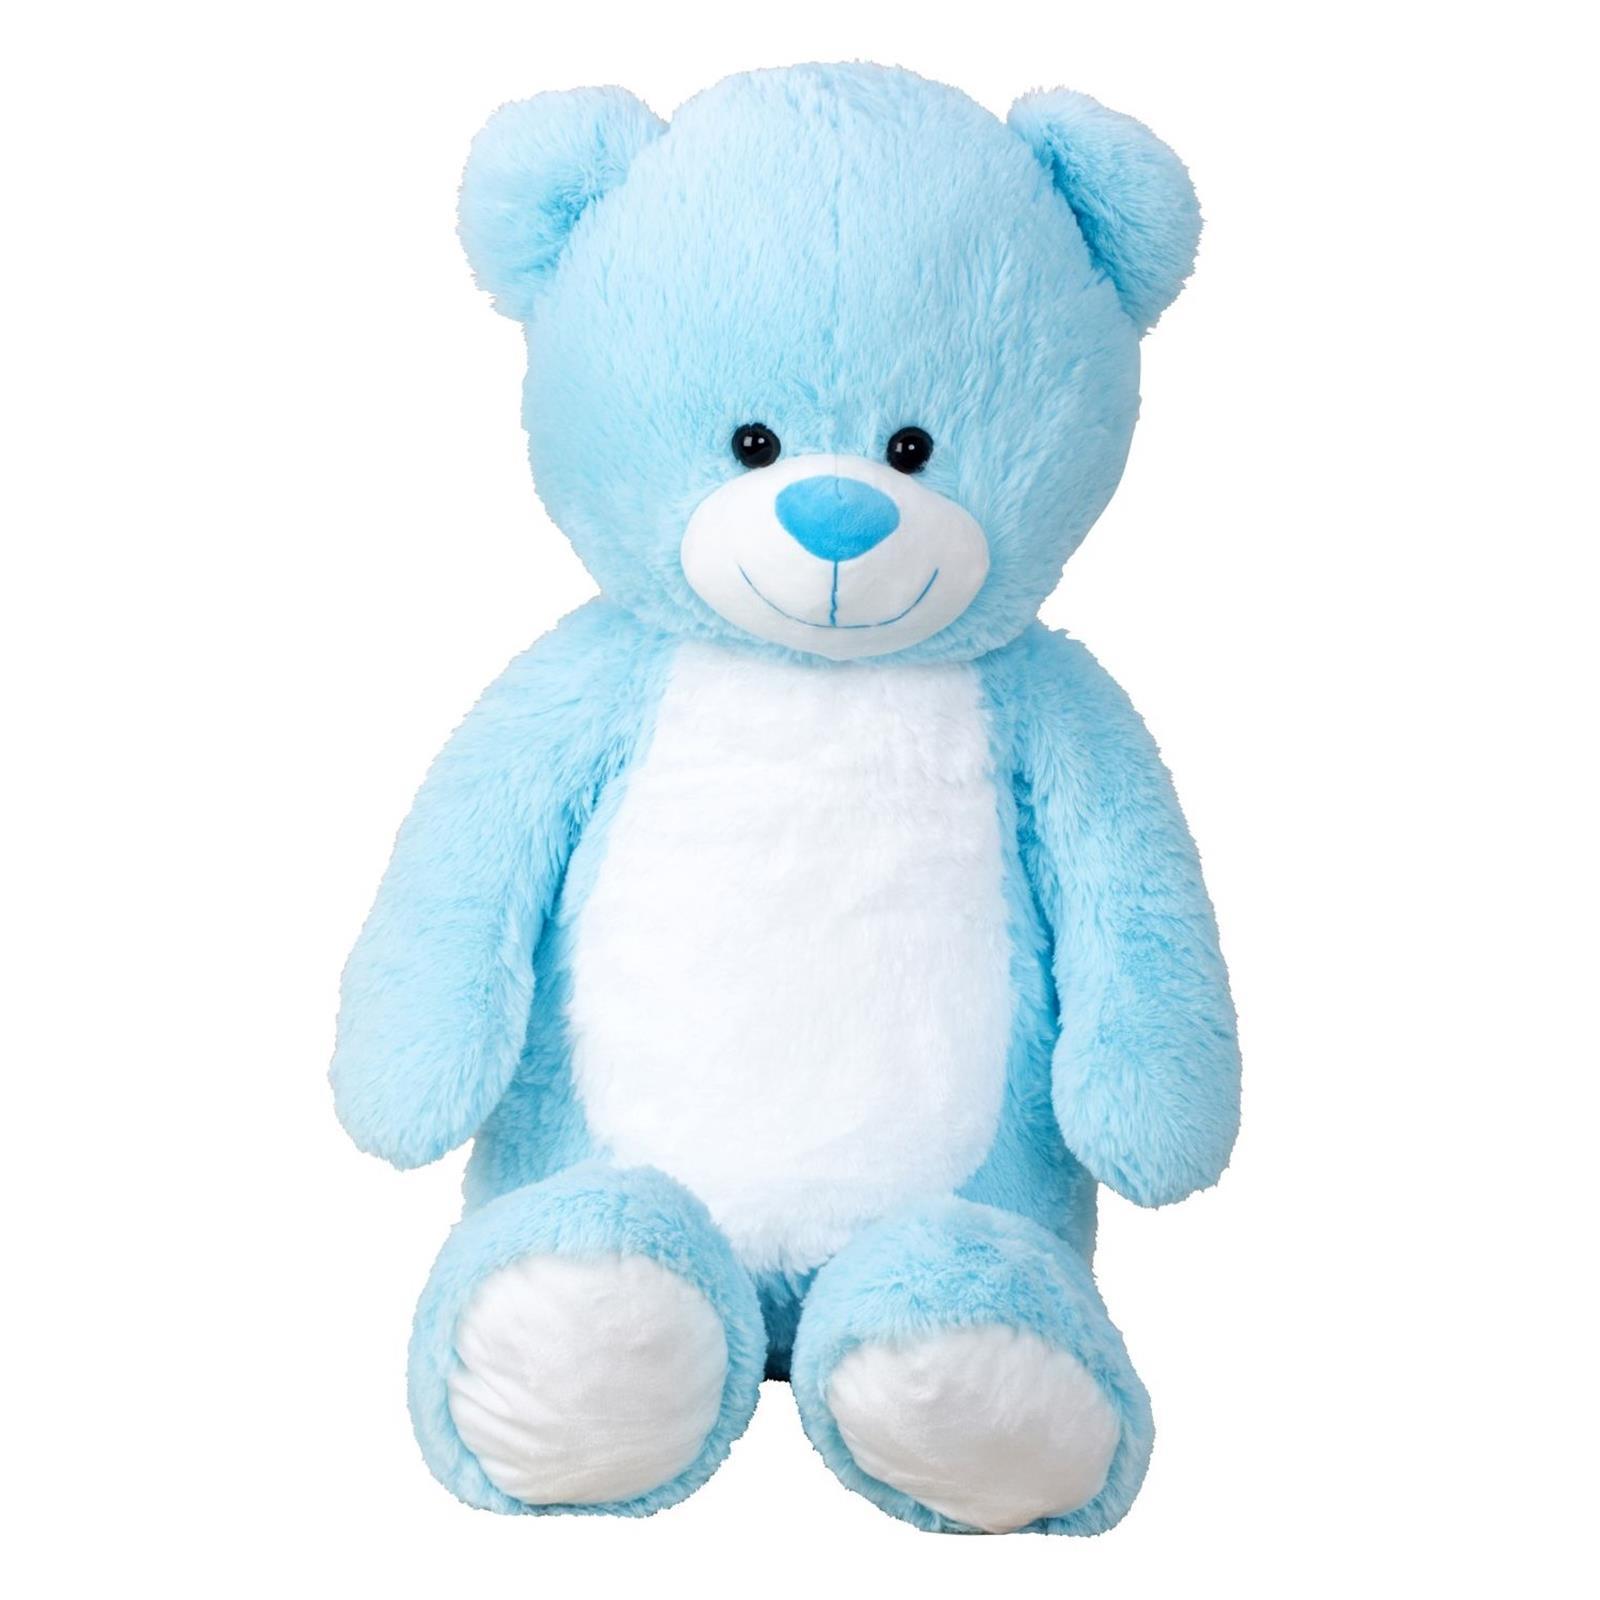 Riesen Teddybär Hellblau